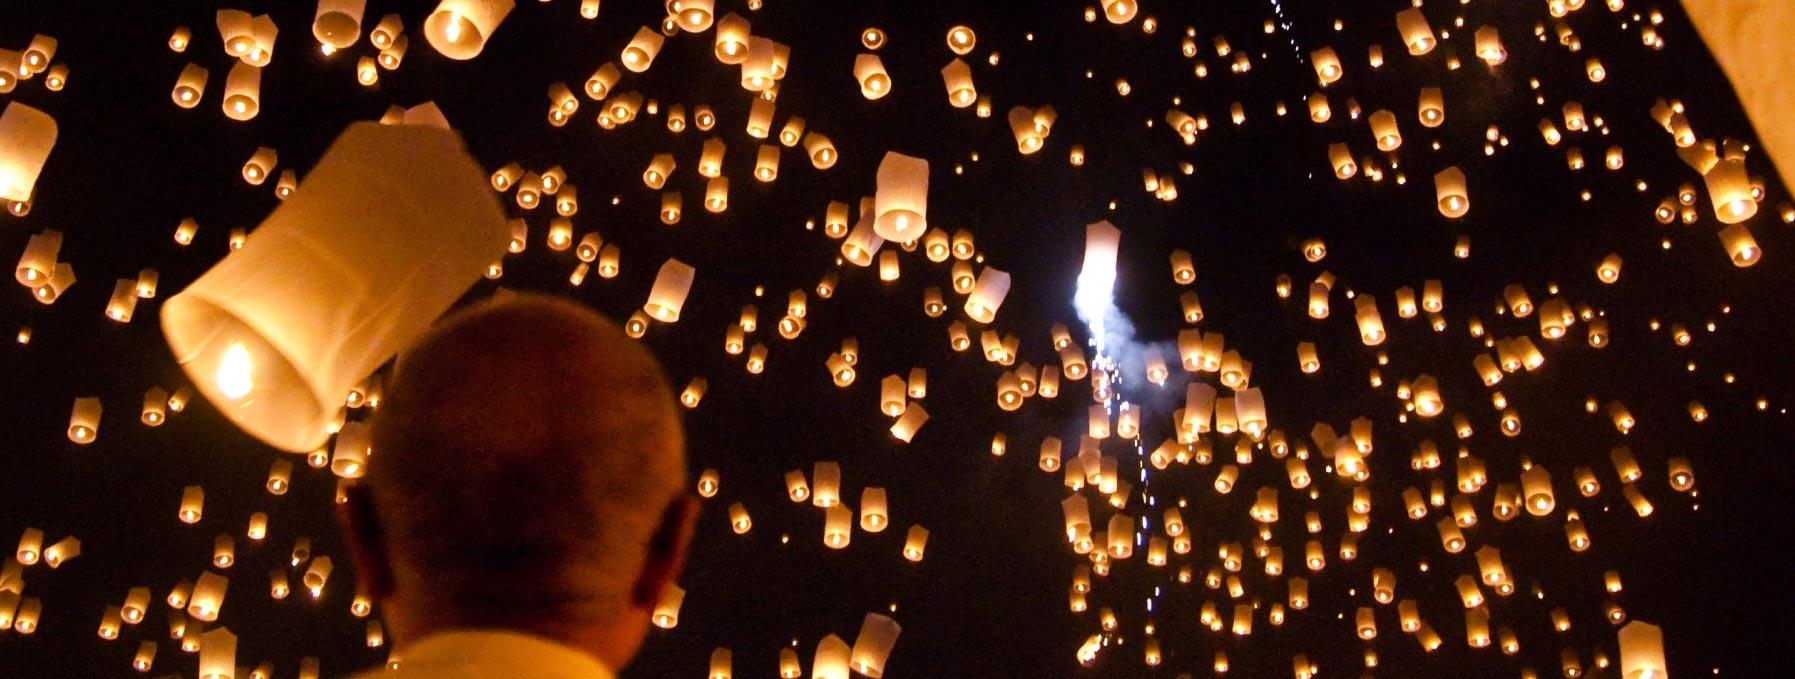 Yi Peng-Sky Lantern Festival of Thailand (Winter Solstice)